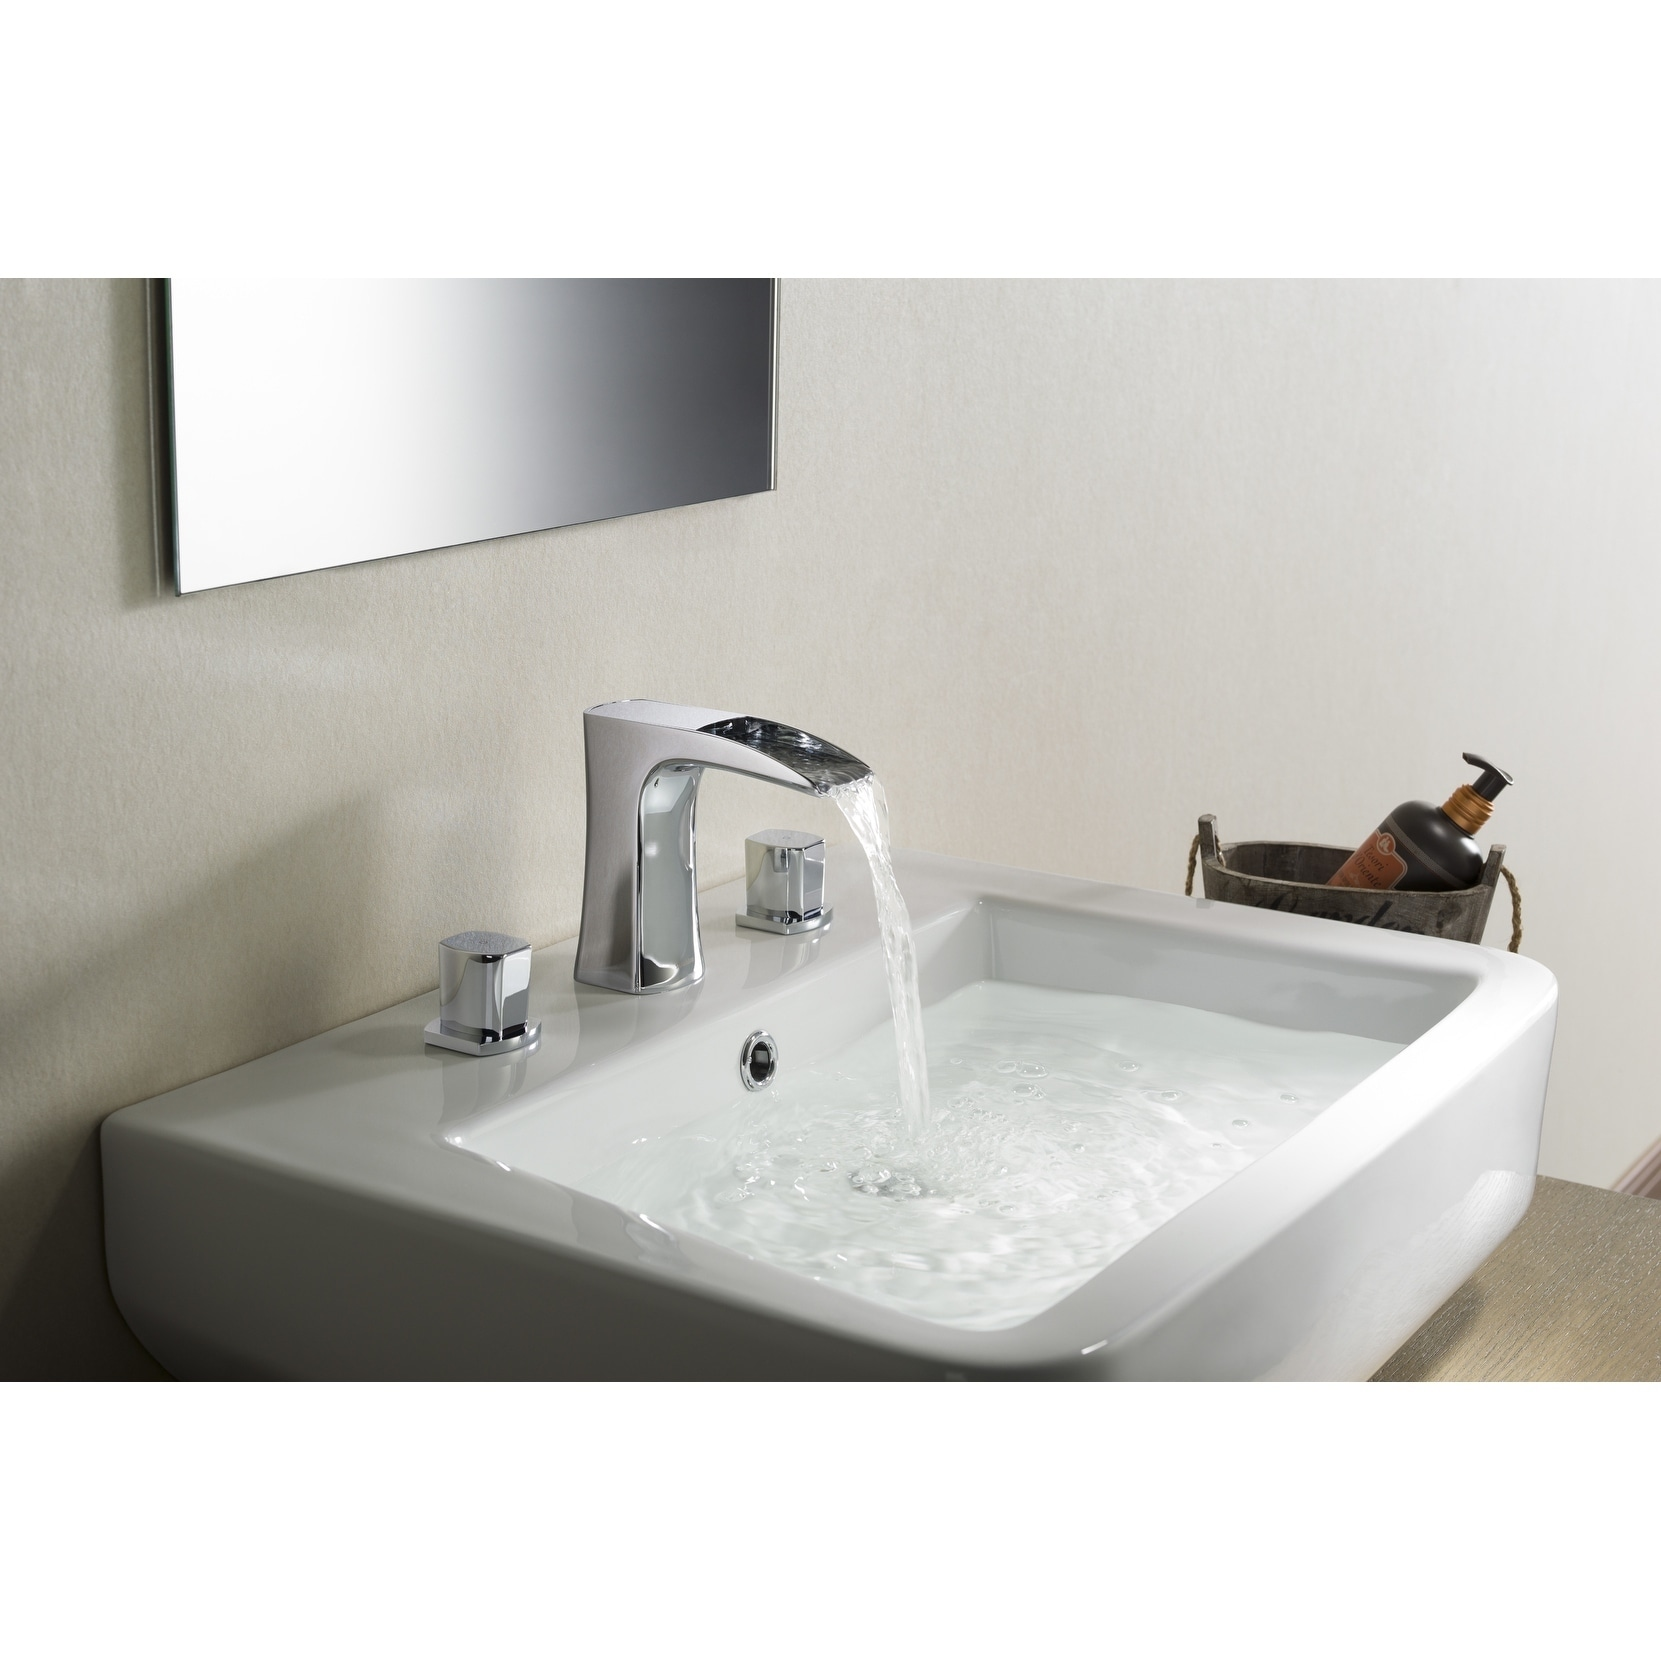 Shop Stufurhome Cascade Bathroom Sink Faucet Set in Matte Black ...